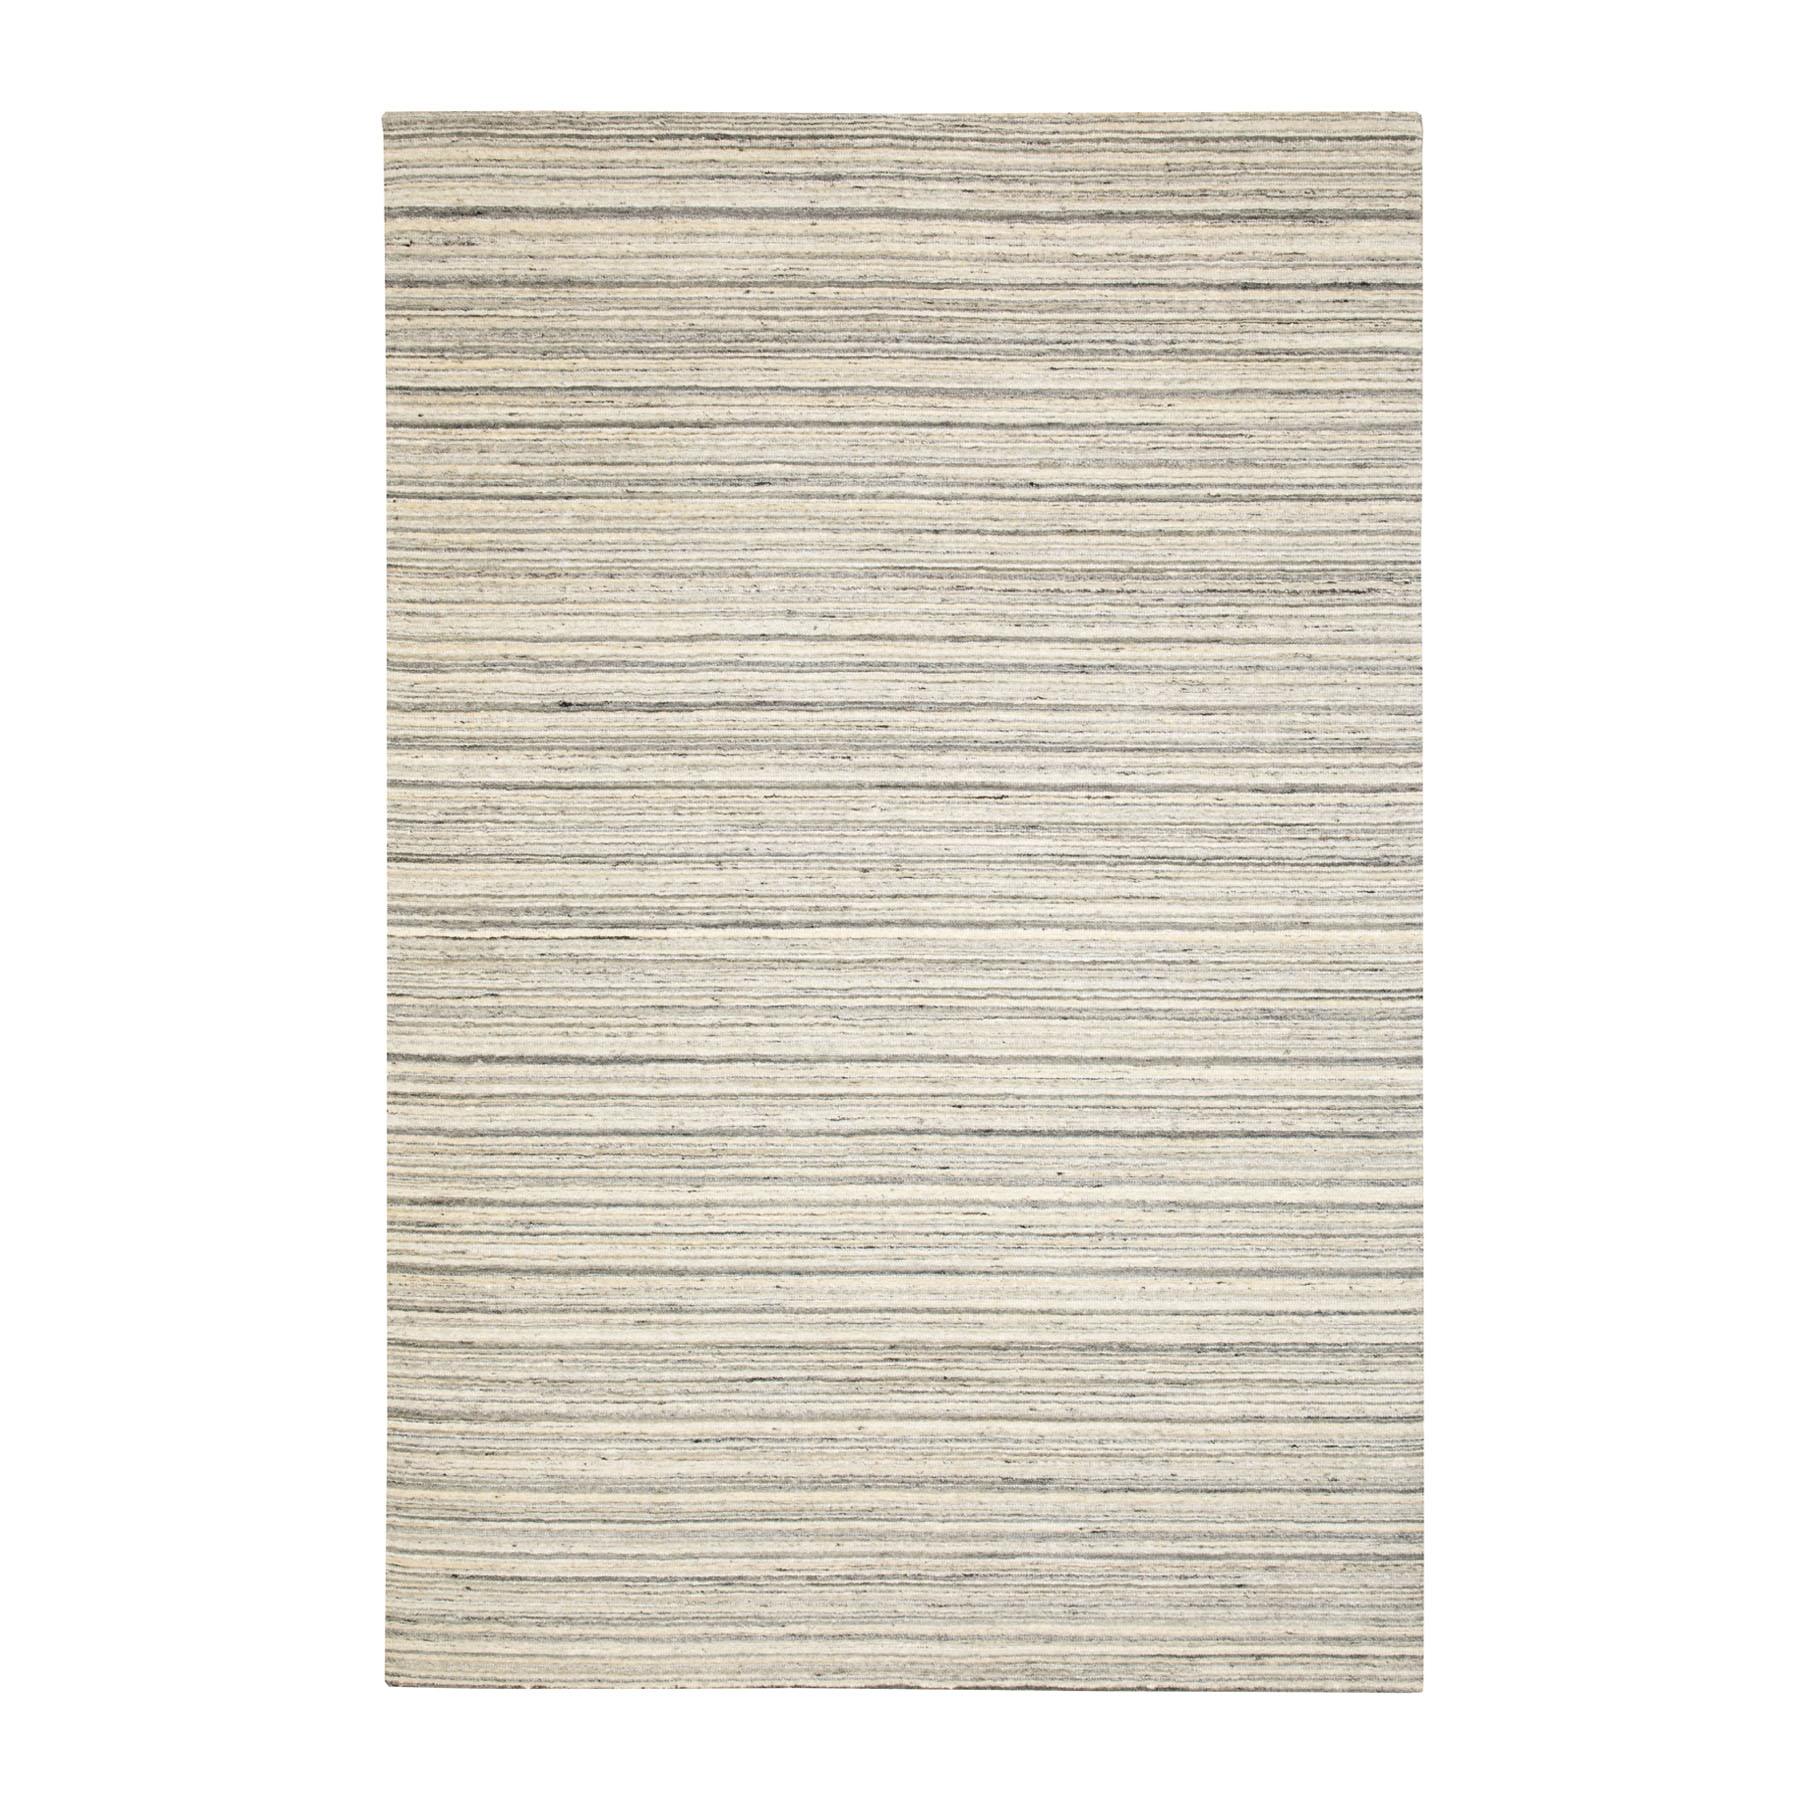 6'X9' Beige Hand Loomed Natural Wool Plain Modern Oriental Rug moae8c77